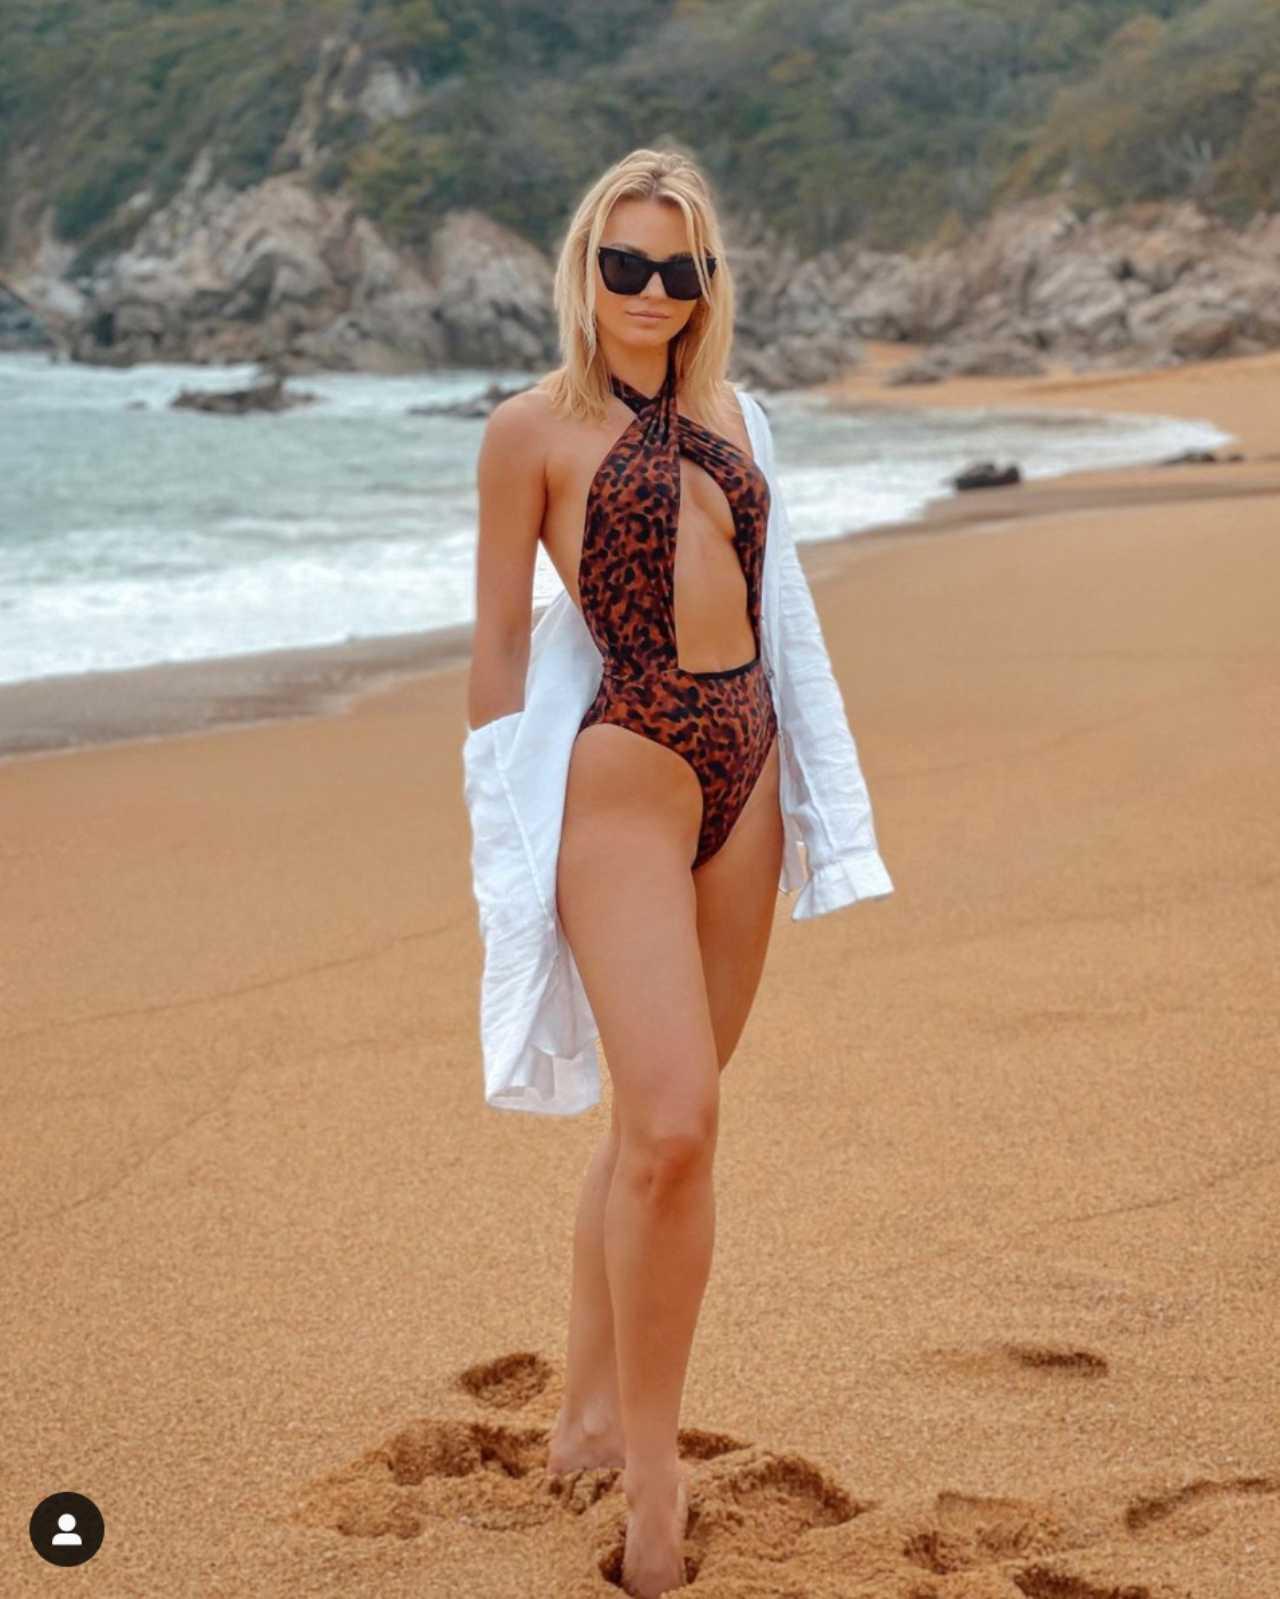 Irina Baeva foto playa tbt instagram